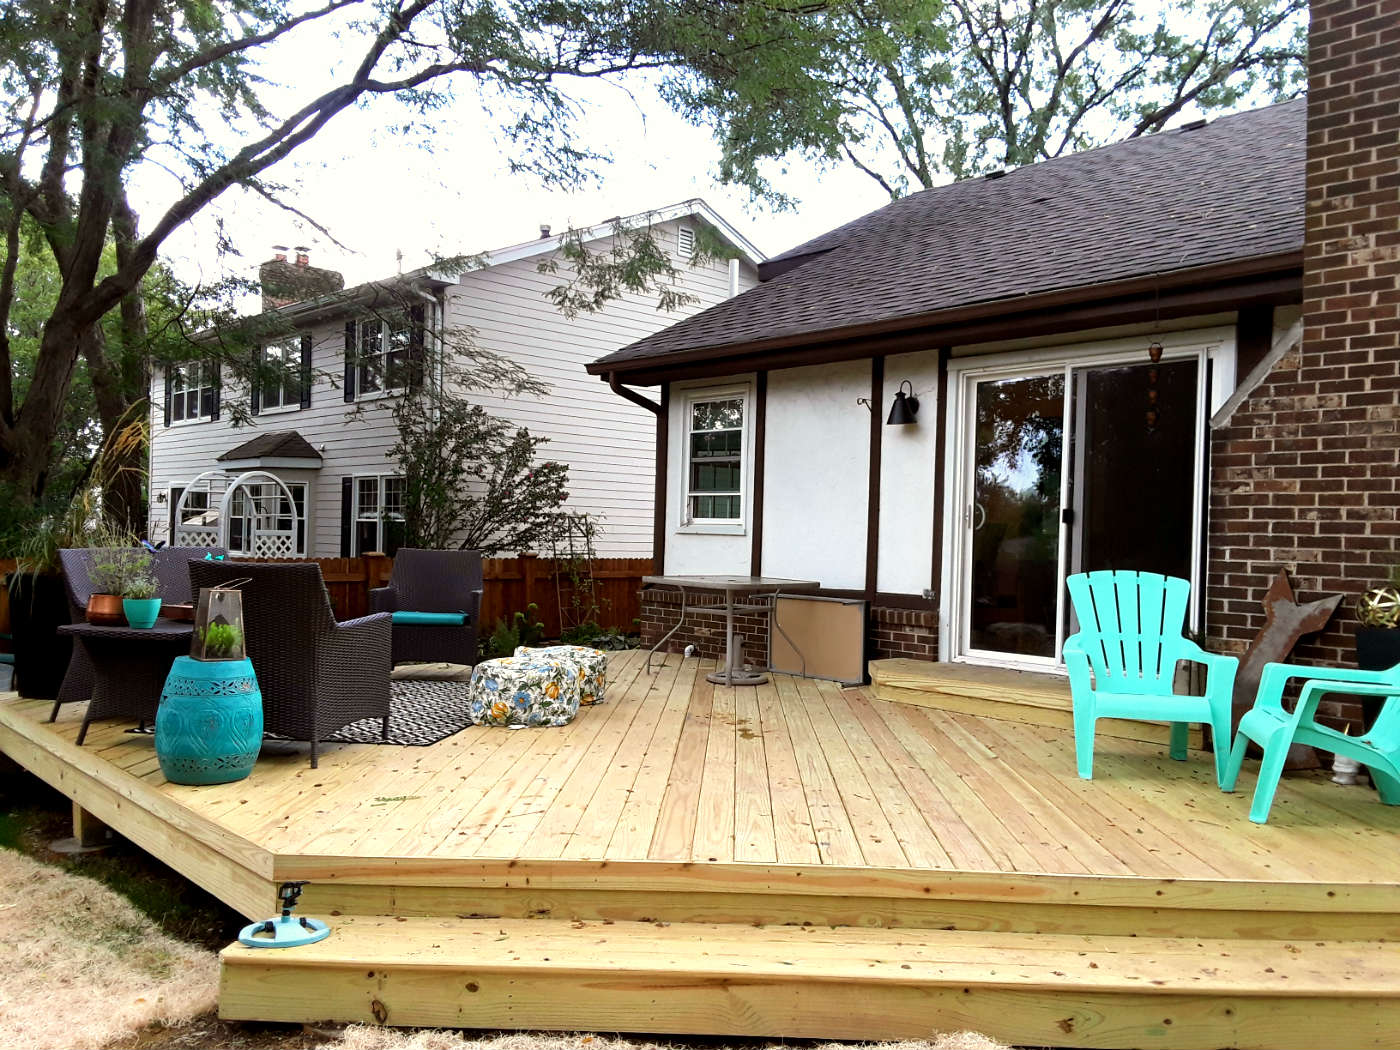 Angled Wood Deck Design by Woodridge, IL Deck Designer Thumbnail